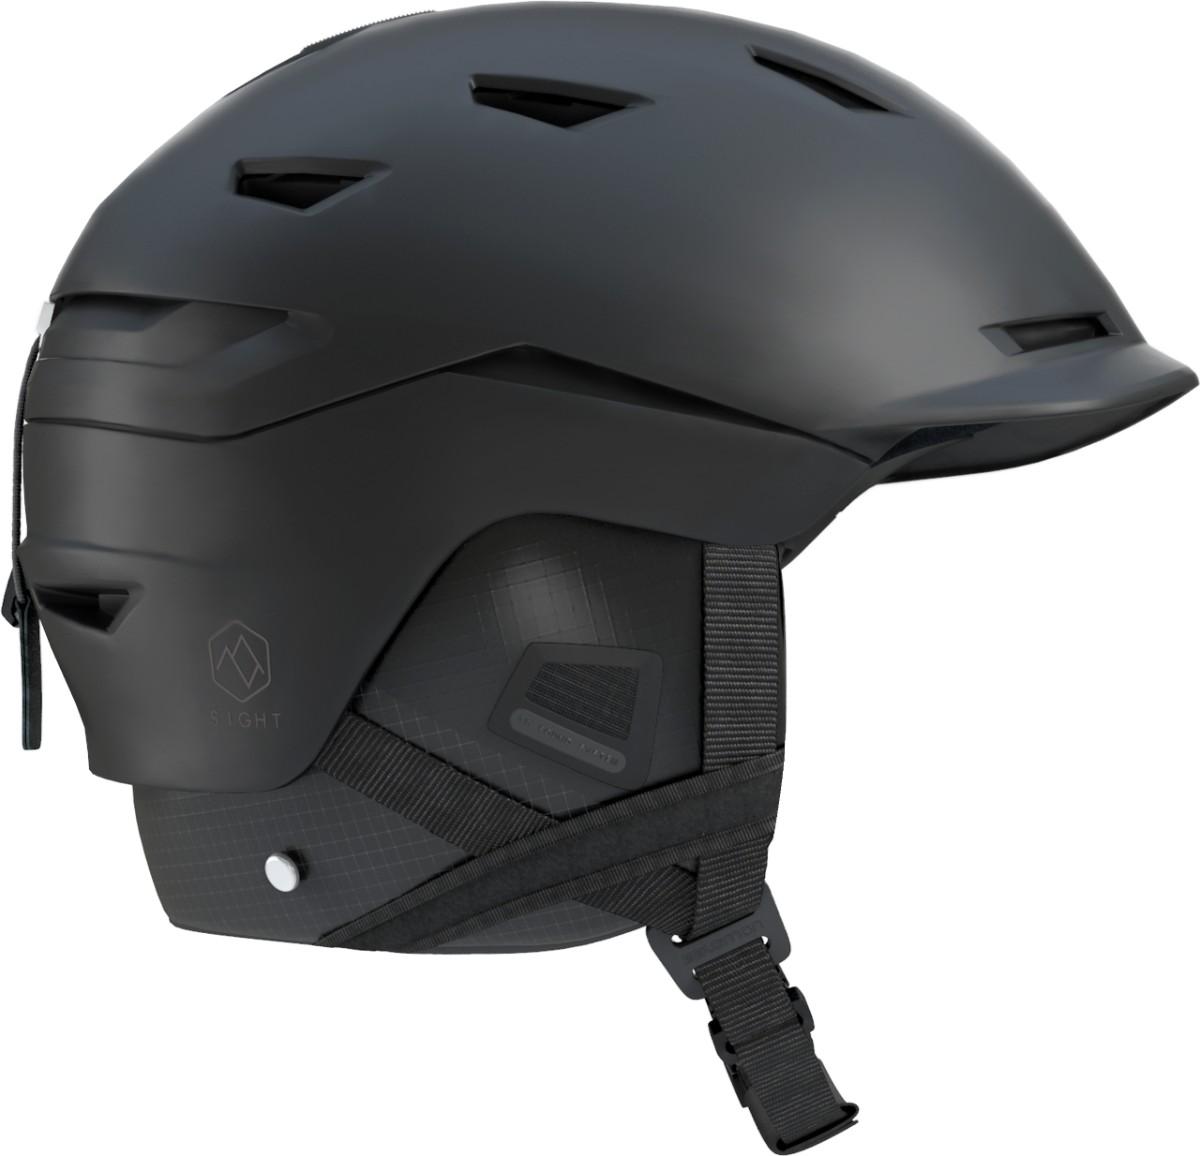 Lyžiarska prilba SALOMON Sight All Black Čierna 56-59 cm